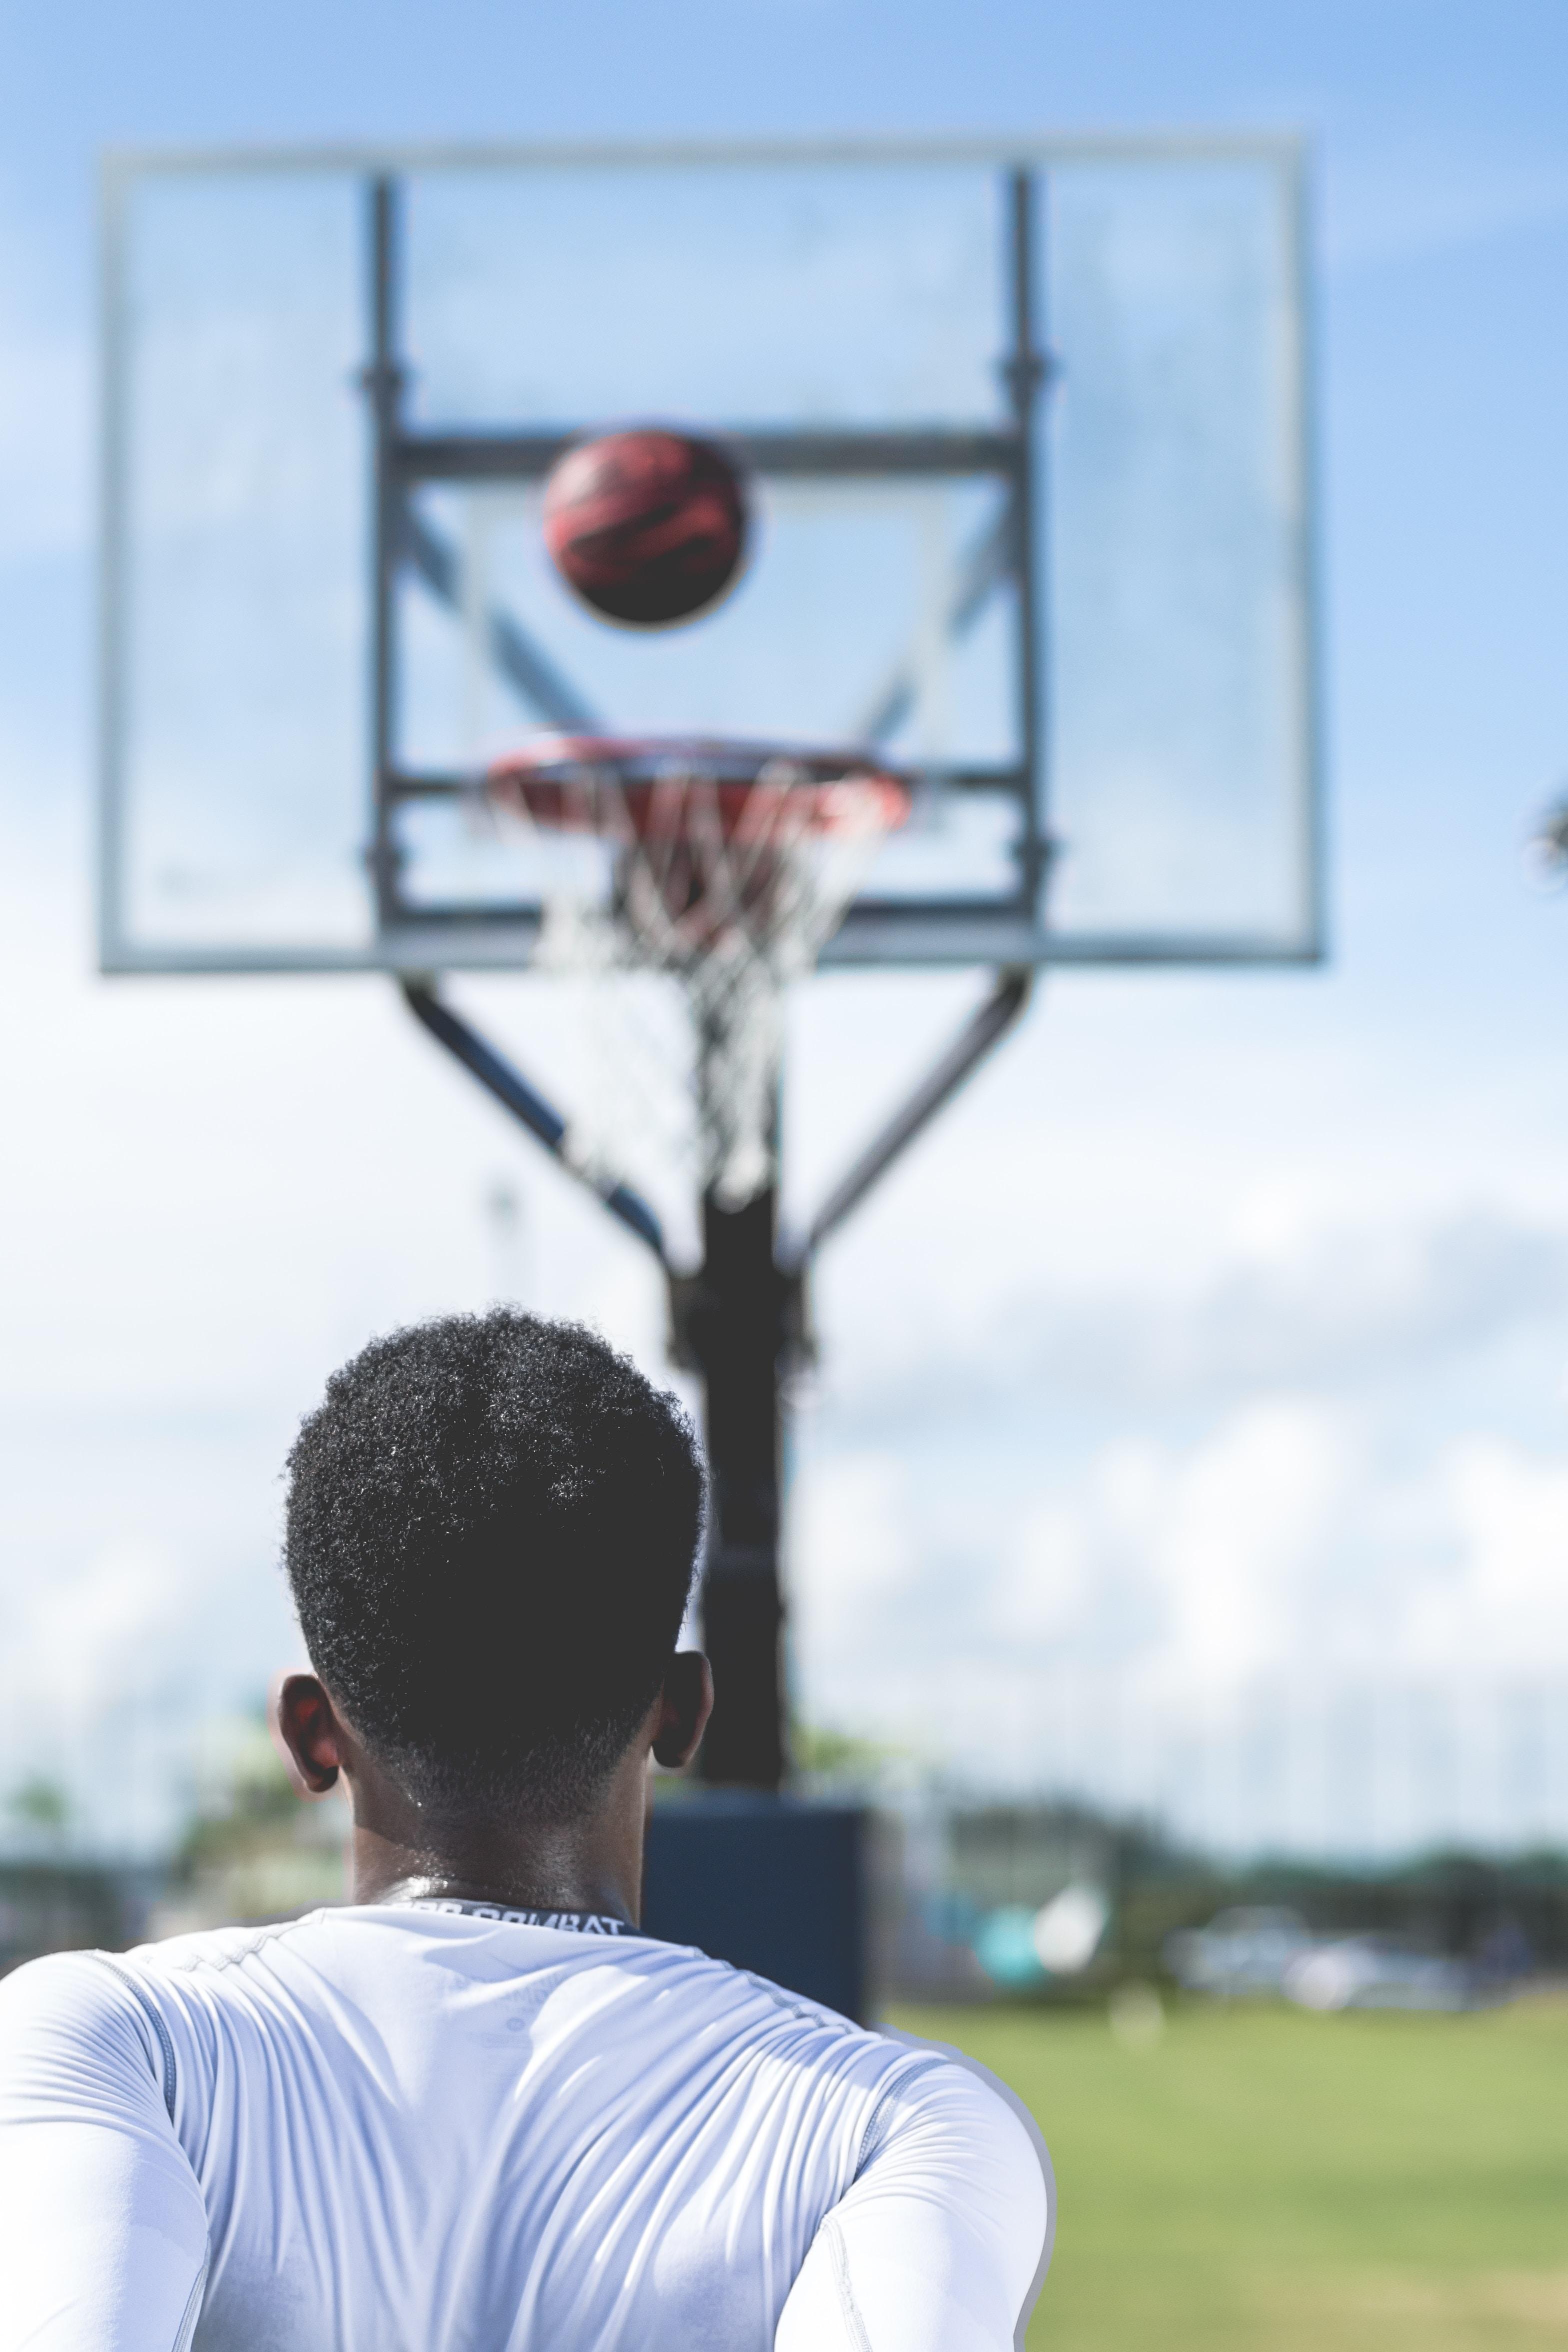 man shoot the ball on basketball ring